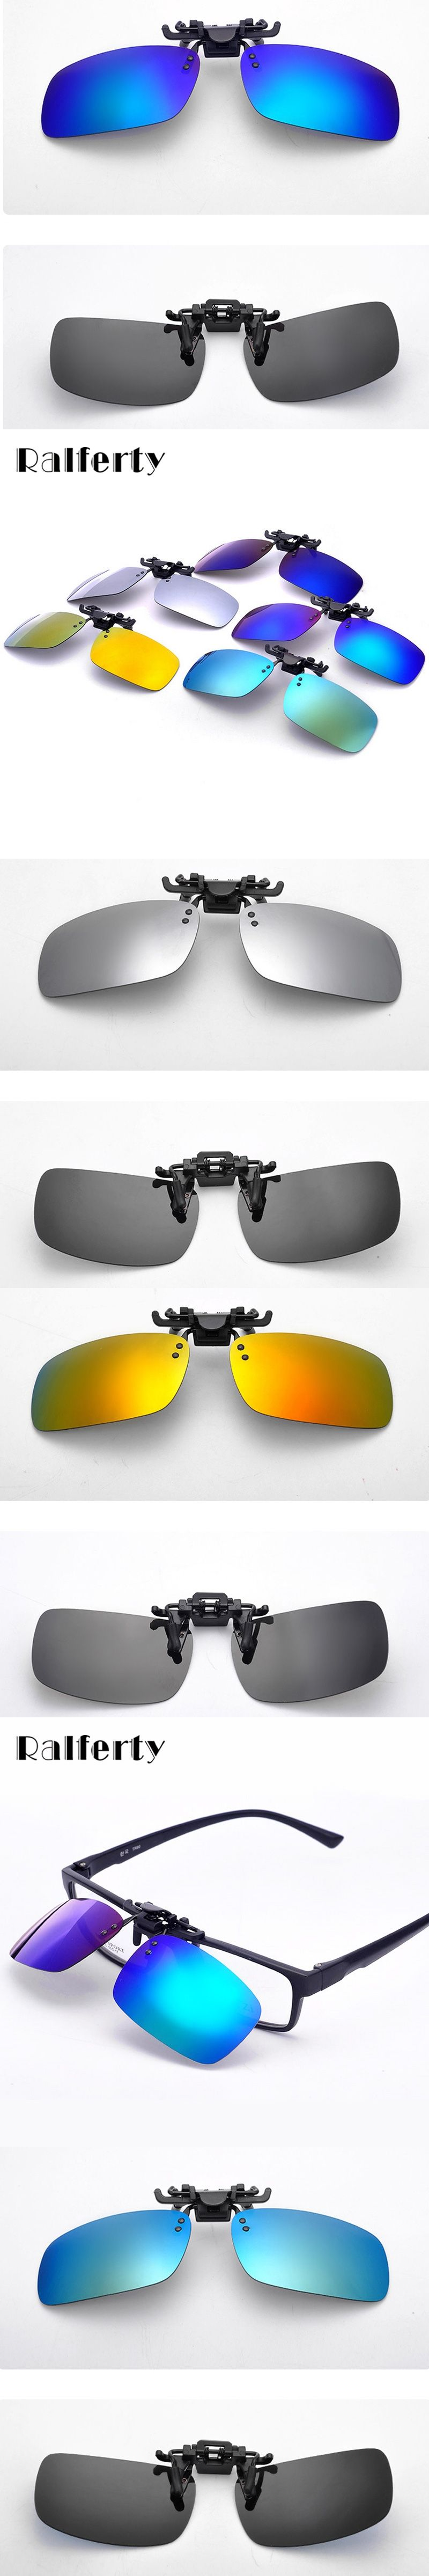 840d2cc2079c Ralferty Polarized Clip on Sunglasses Men Flip Up Polaroid Sun Glasses Lens  Coating Glasses Driving Sport Goggles Plastic Case